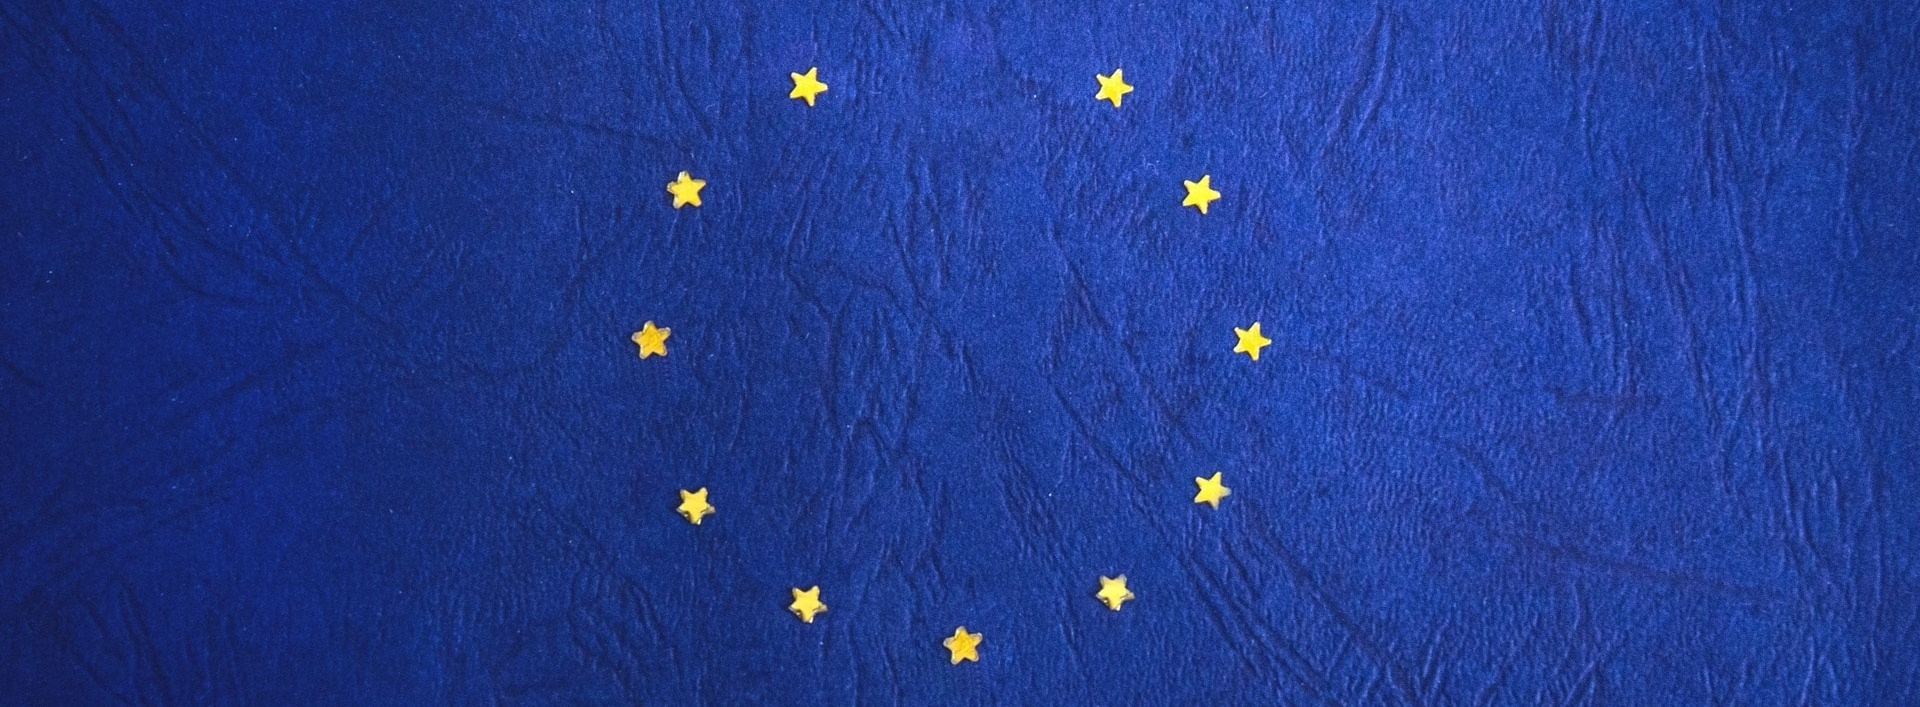 european_union-min-193766-edited.jpeg